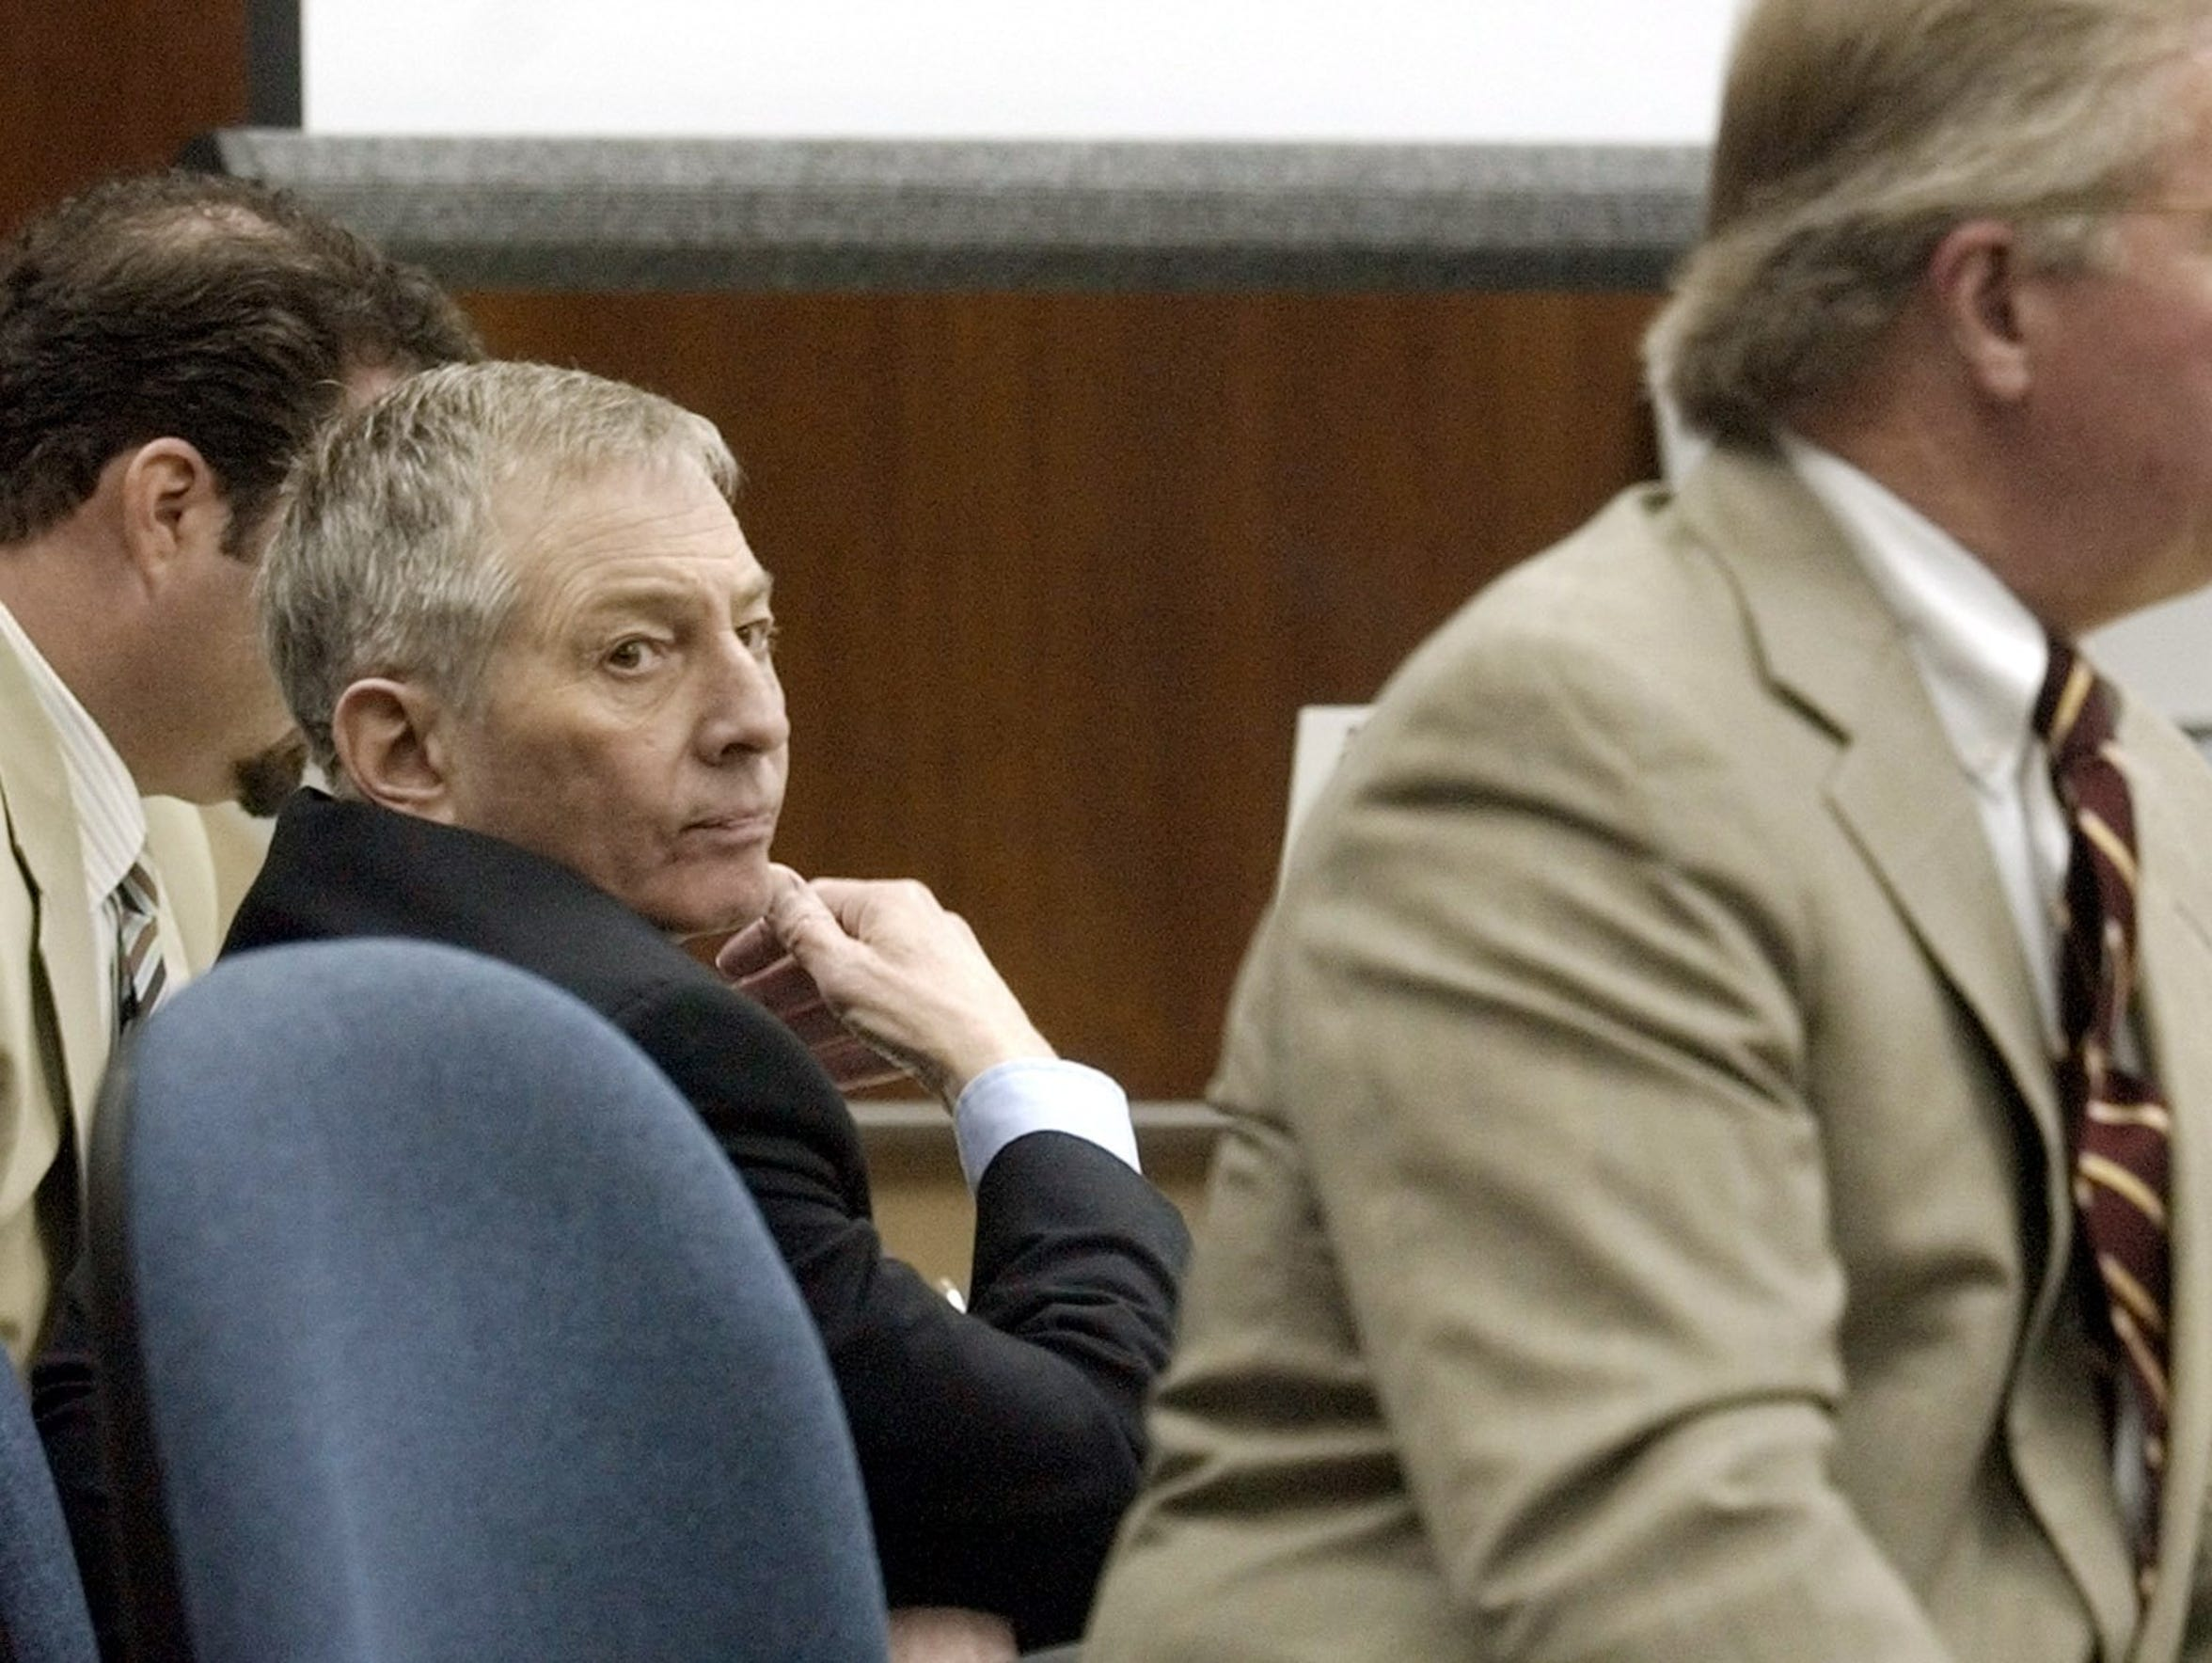 Robert Durst, center, looks toward the jury as his